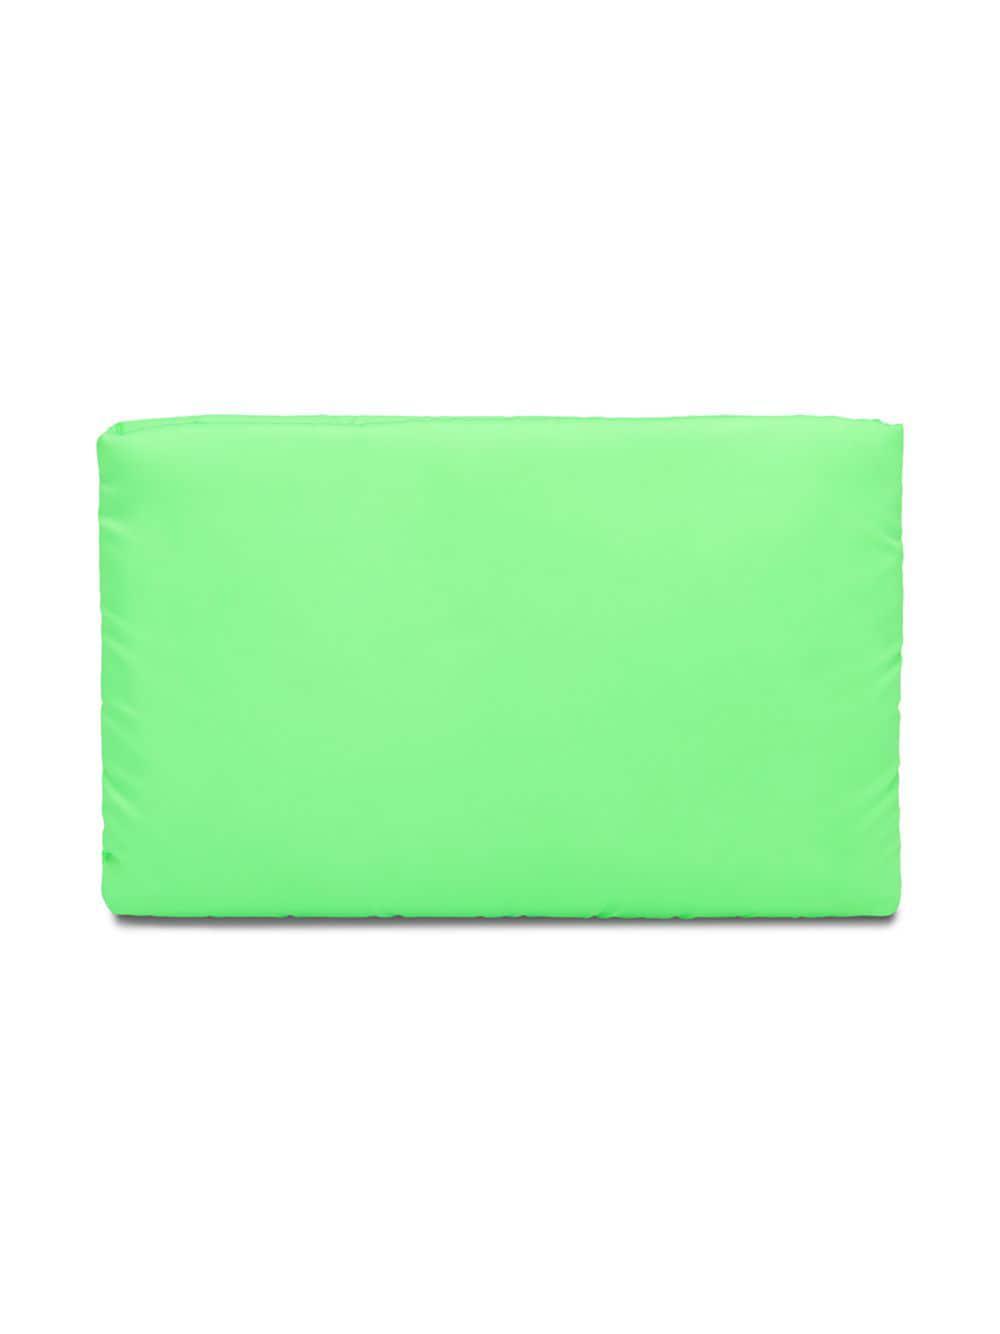 0e559c363418 Lyst - Prada Fluorescent Green Medium Padded Nylon Clutch in Green